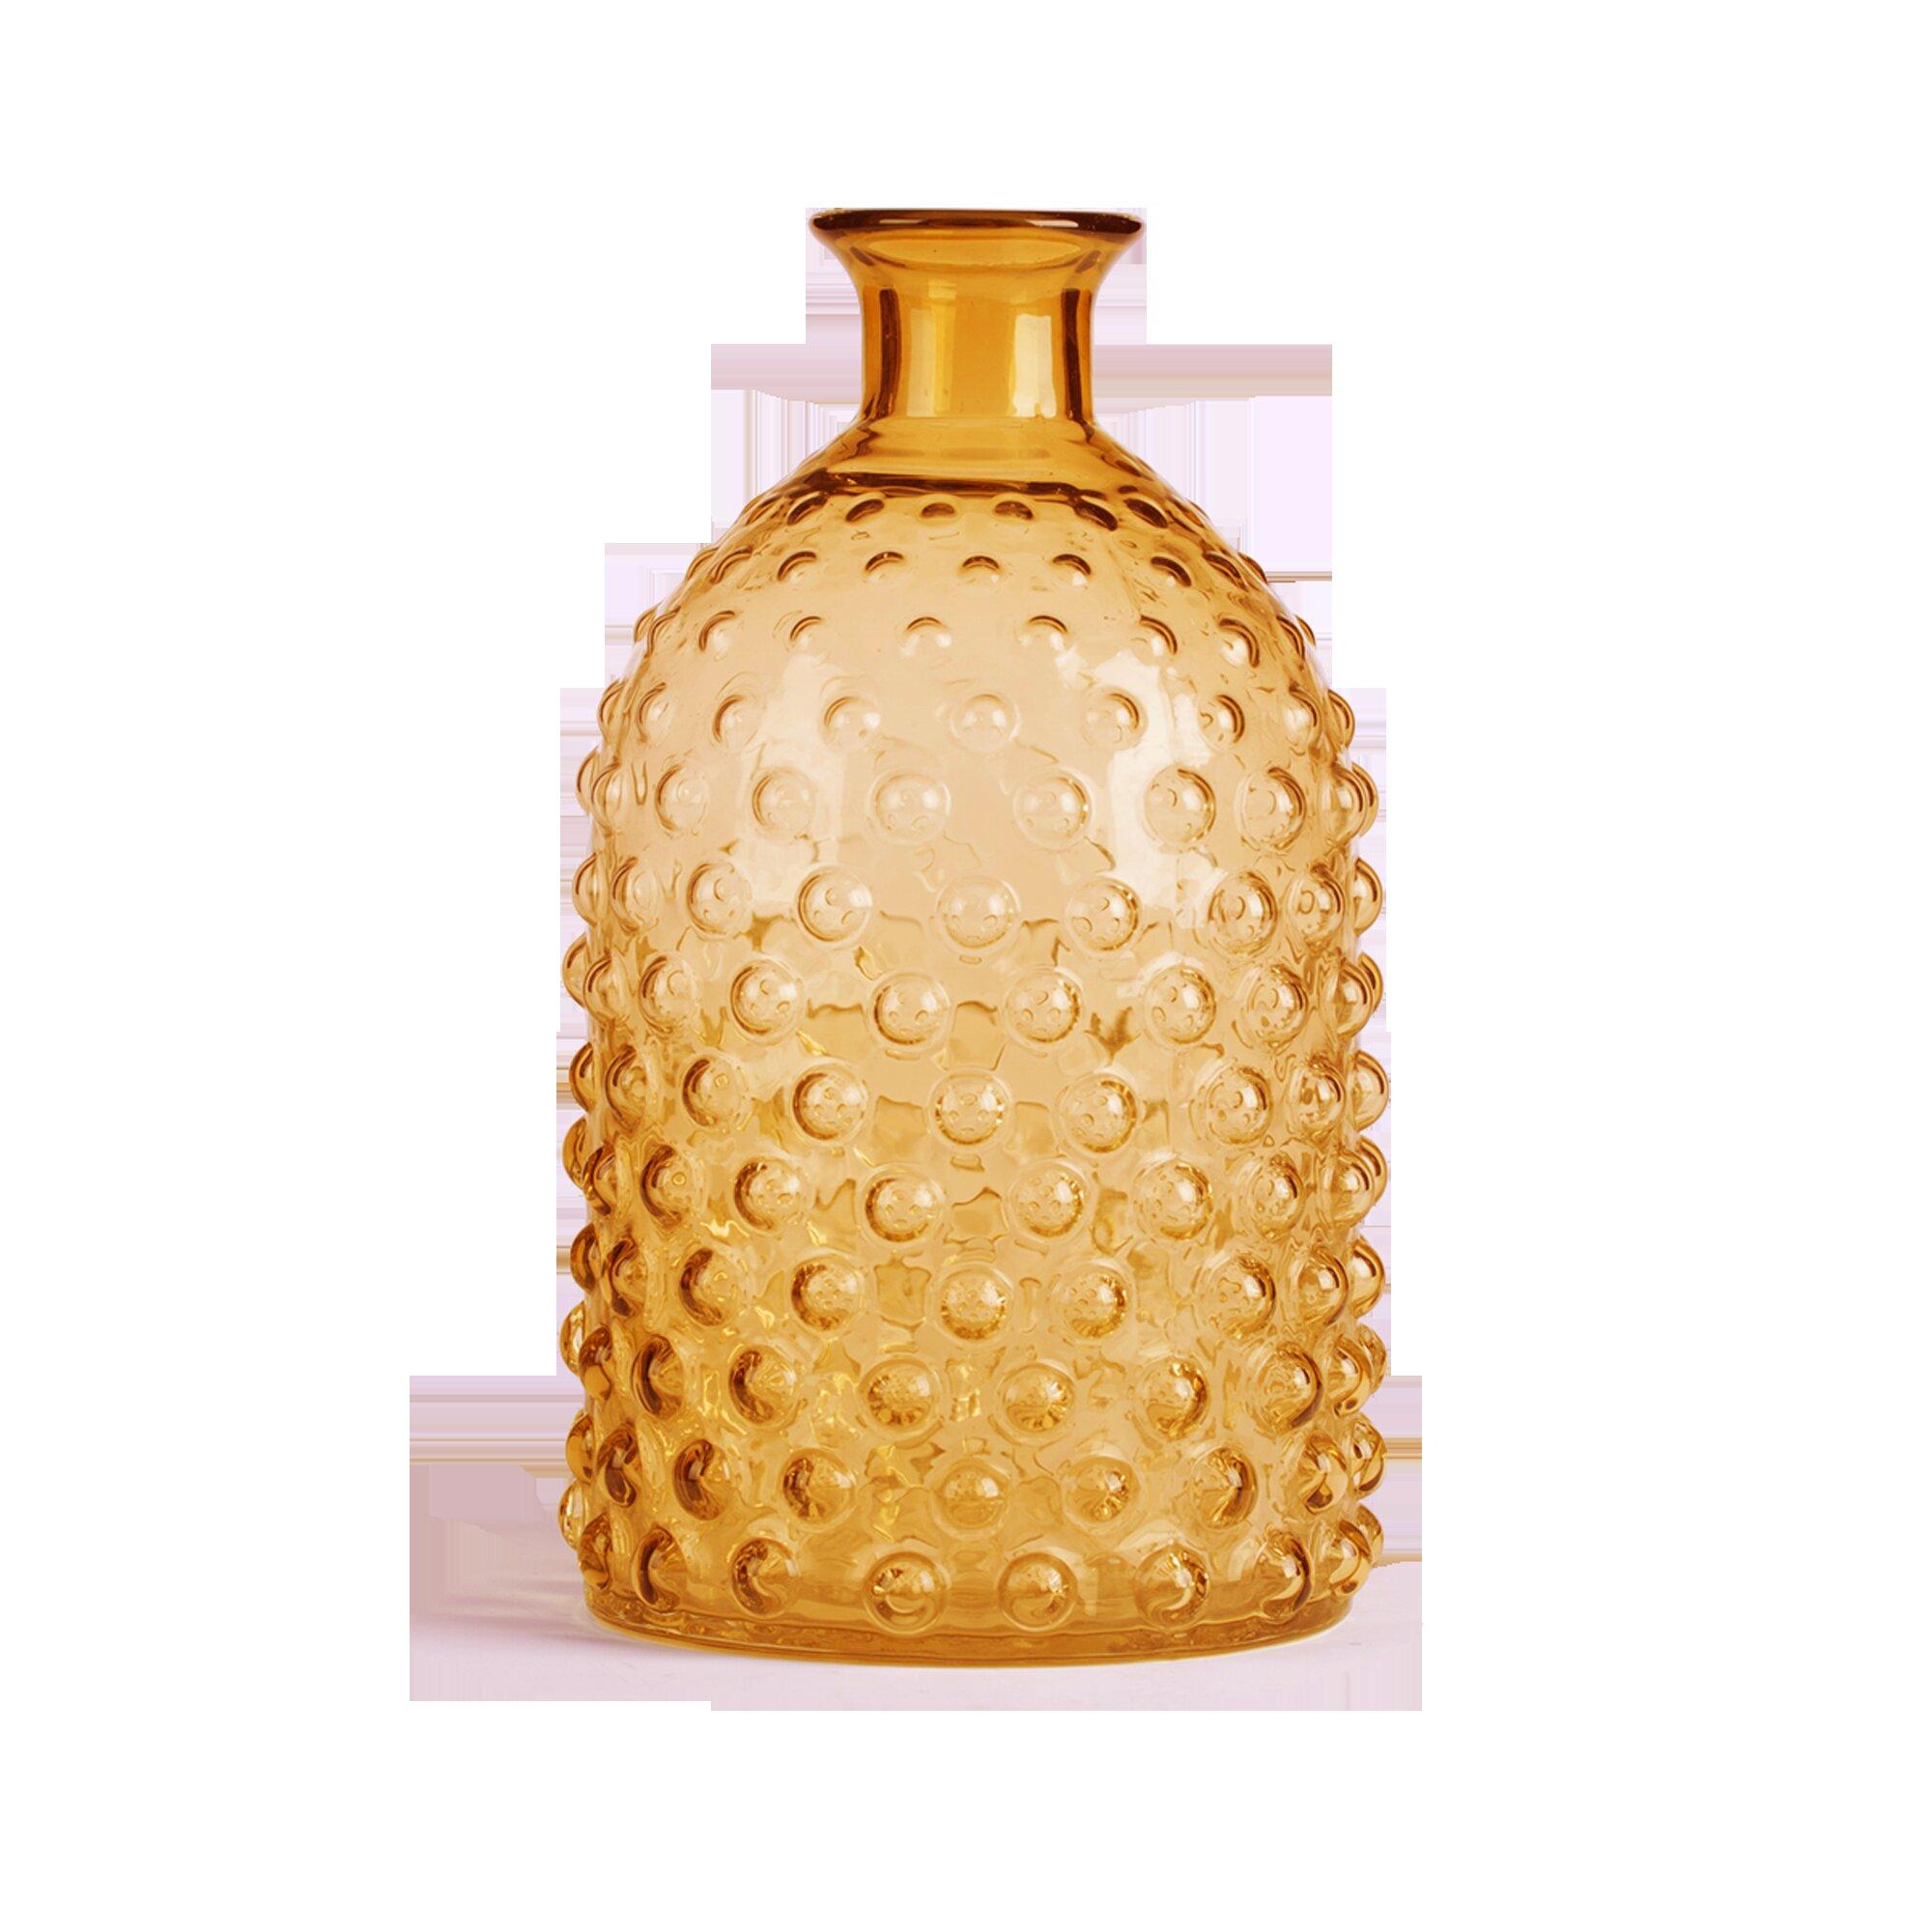 Glitzhome Hobnail Tabletop Glass Vase | Wayfair